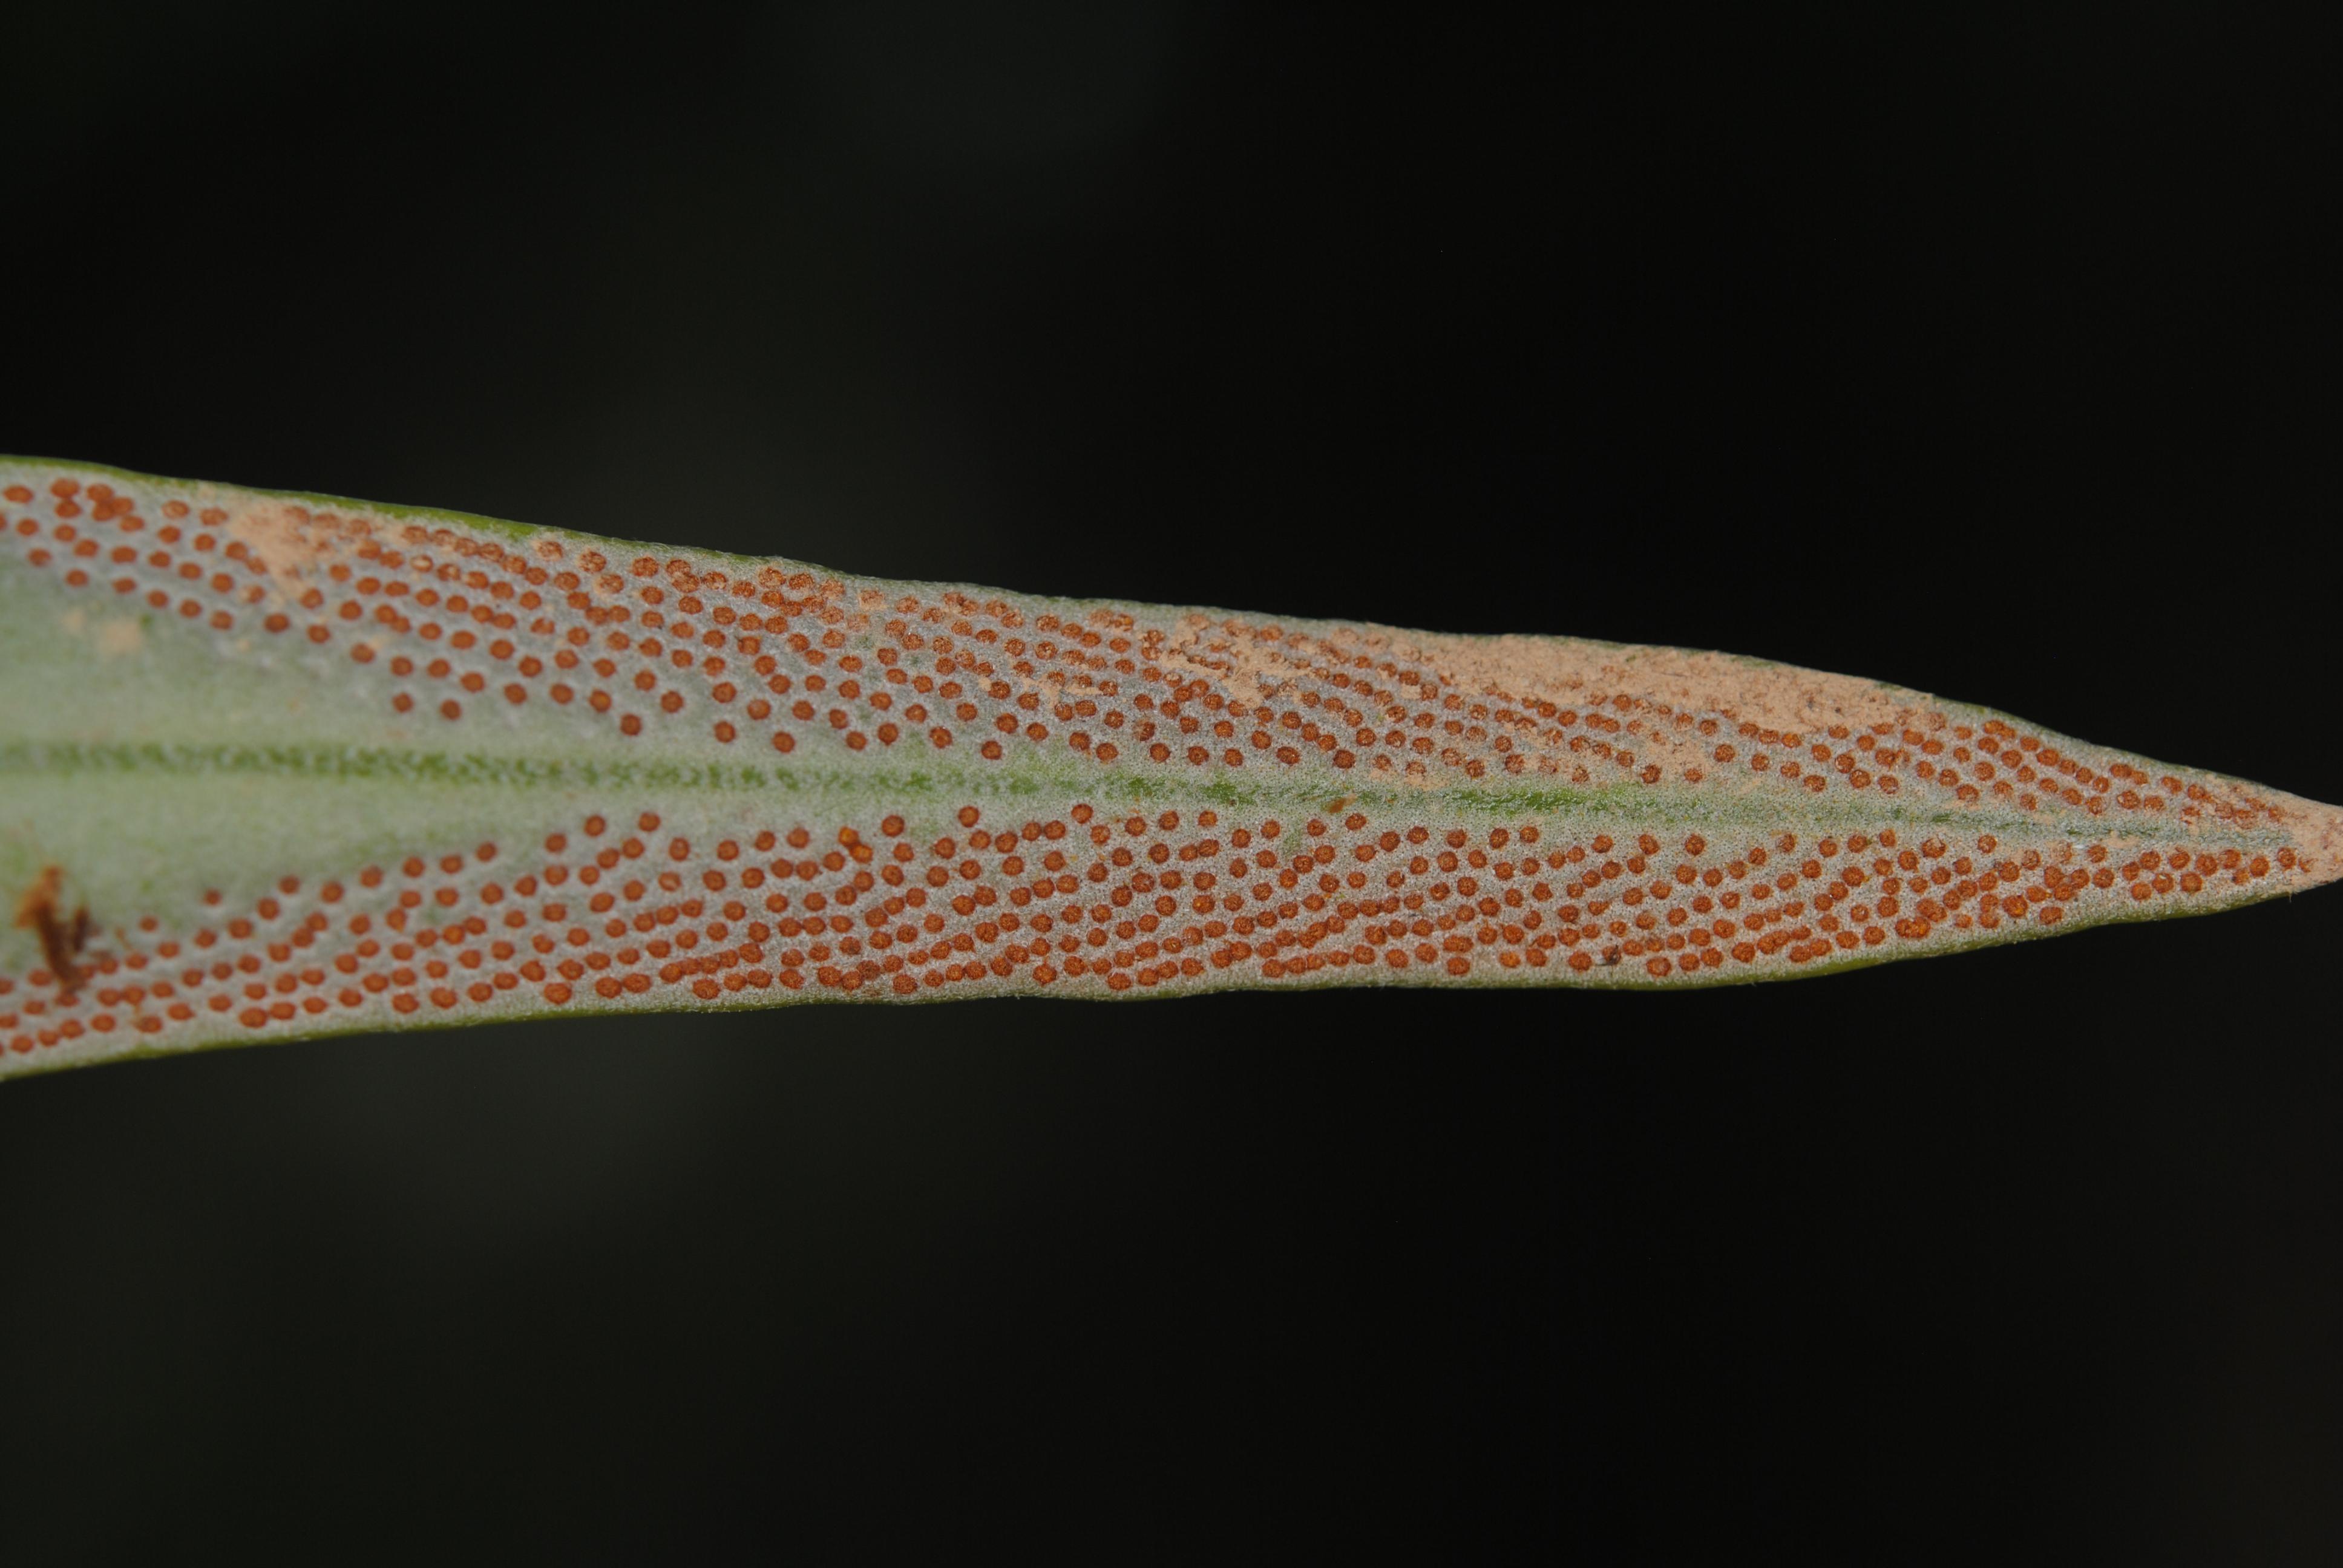 Pyrrrosia longifolia